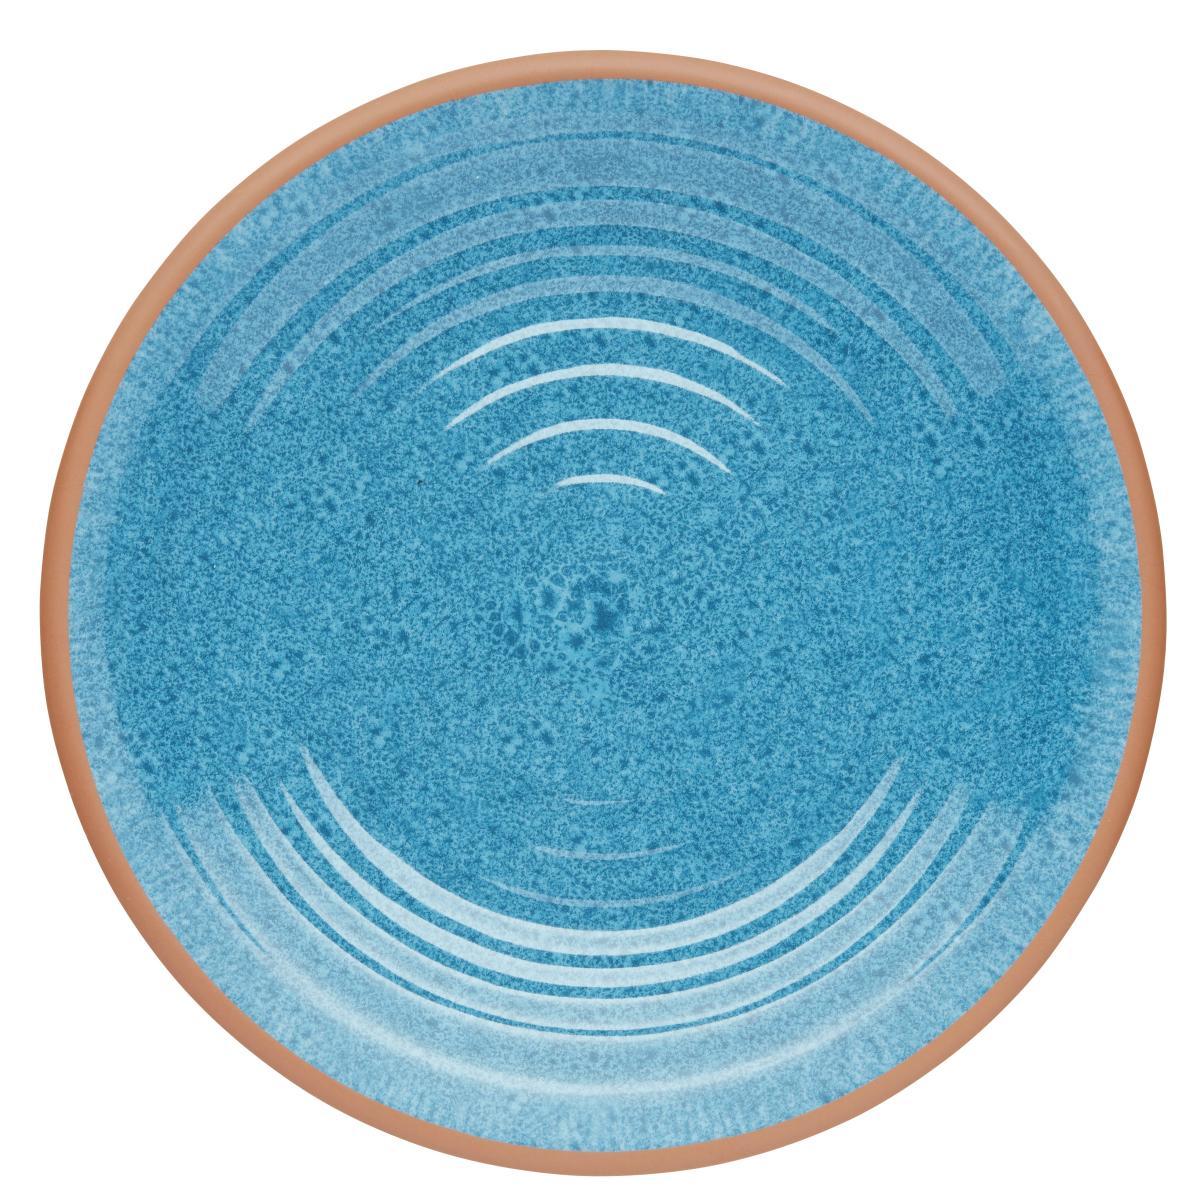 KitchenCraft u0027We Love Summeru0027 Terracotta-Style Melamine Dinner Plate (26.5 cm)  sc 1 st  Amazon UK & KitchenCraft We Love Summer Terracotta-Style Melamine Dinner Plate ...